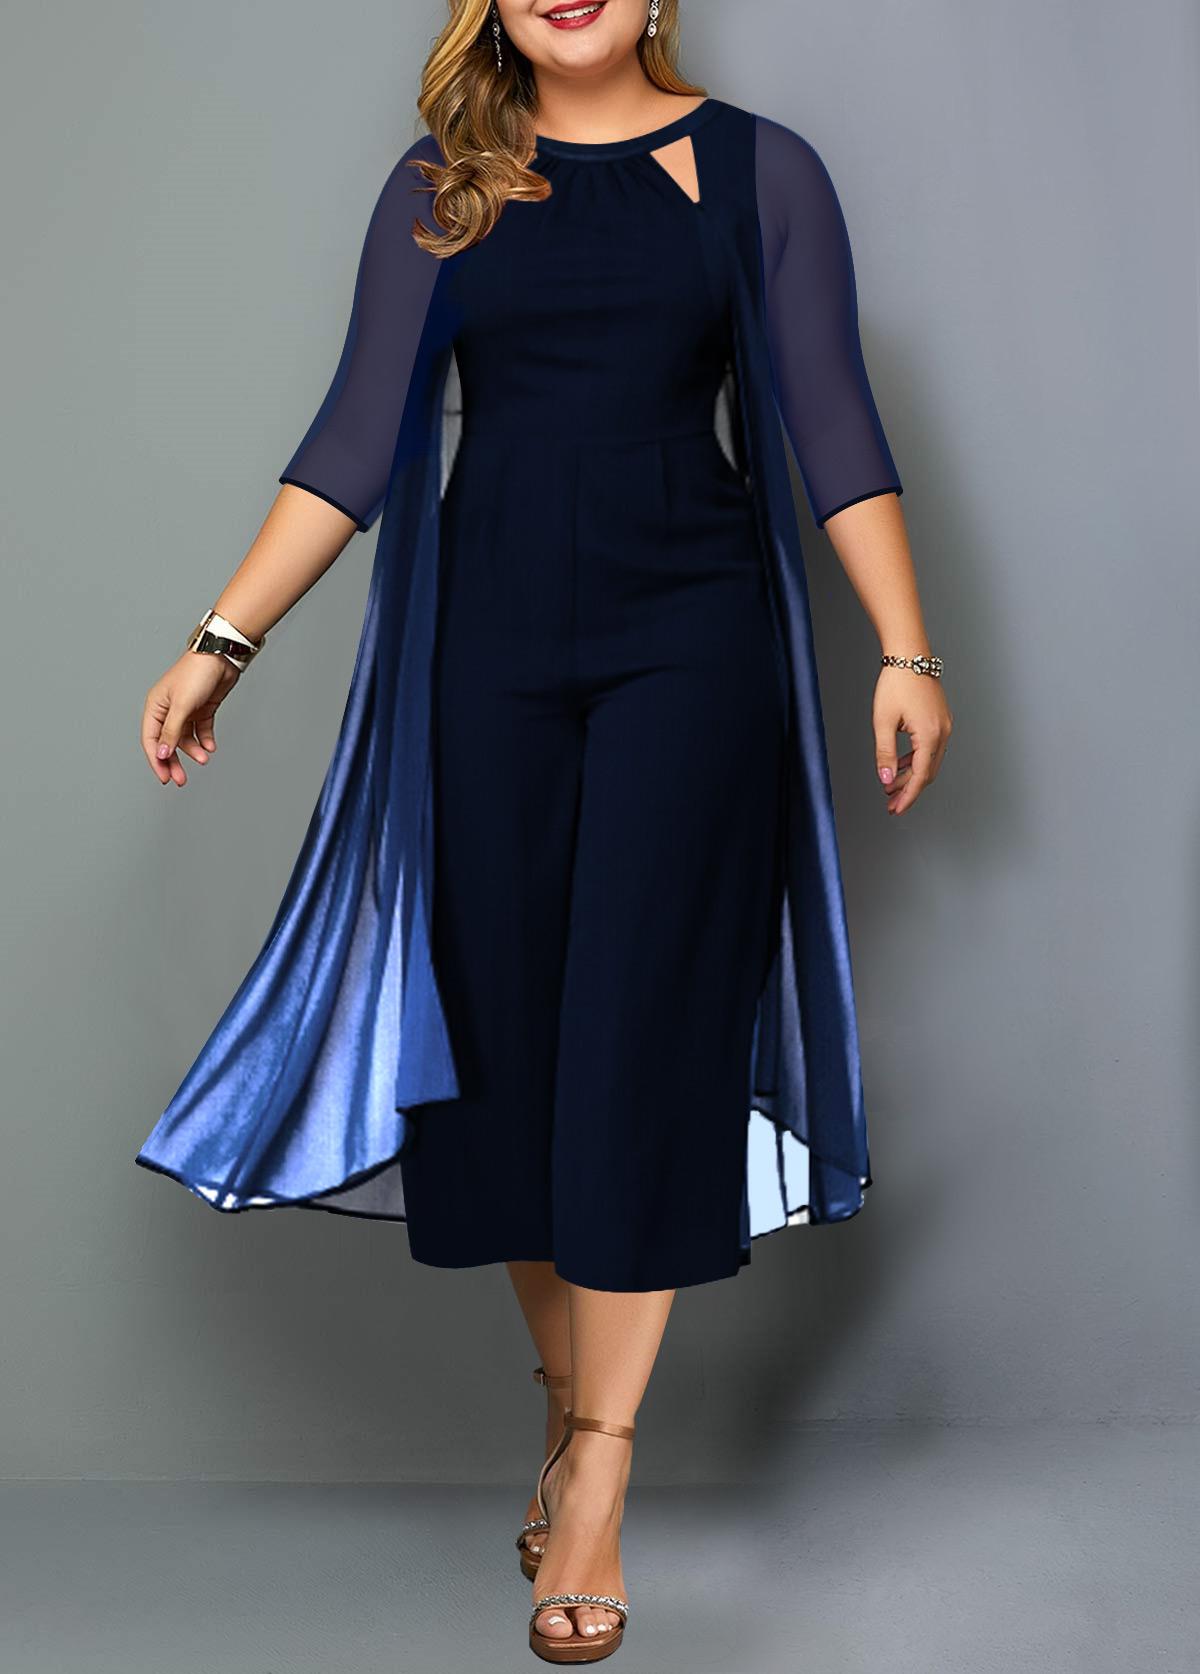 Gradient Chiffon Overlay Plus Size Jumpsuit